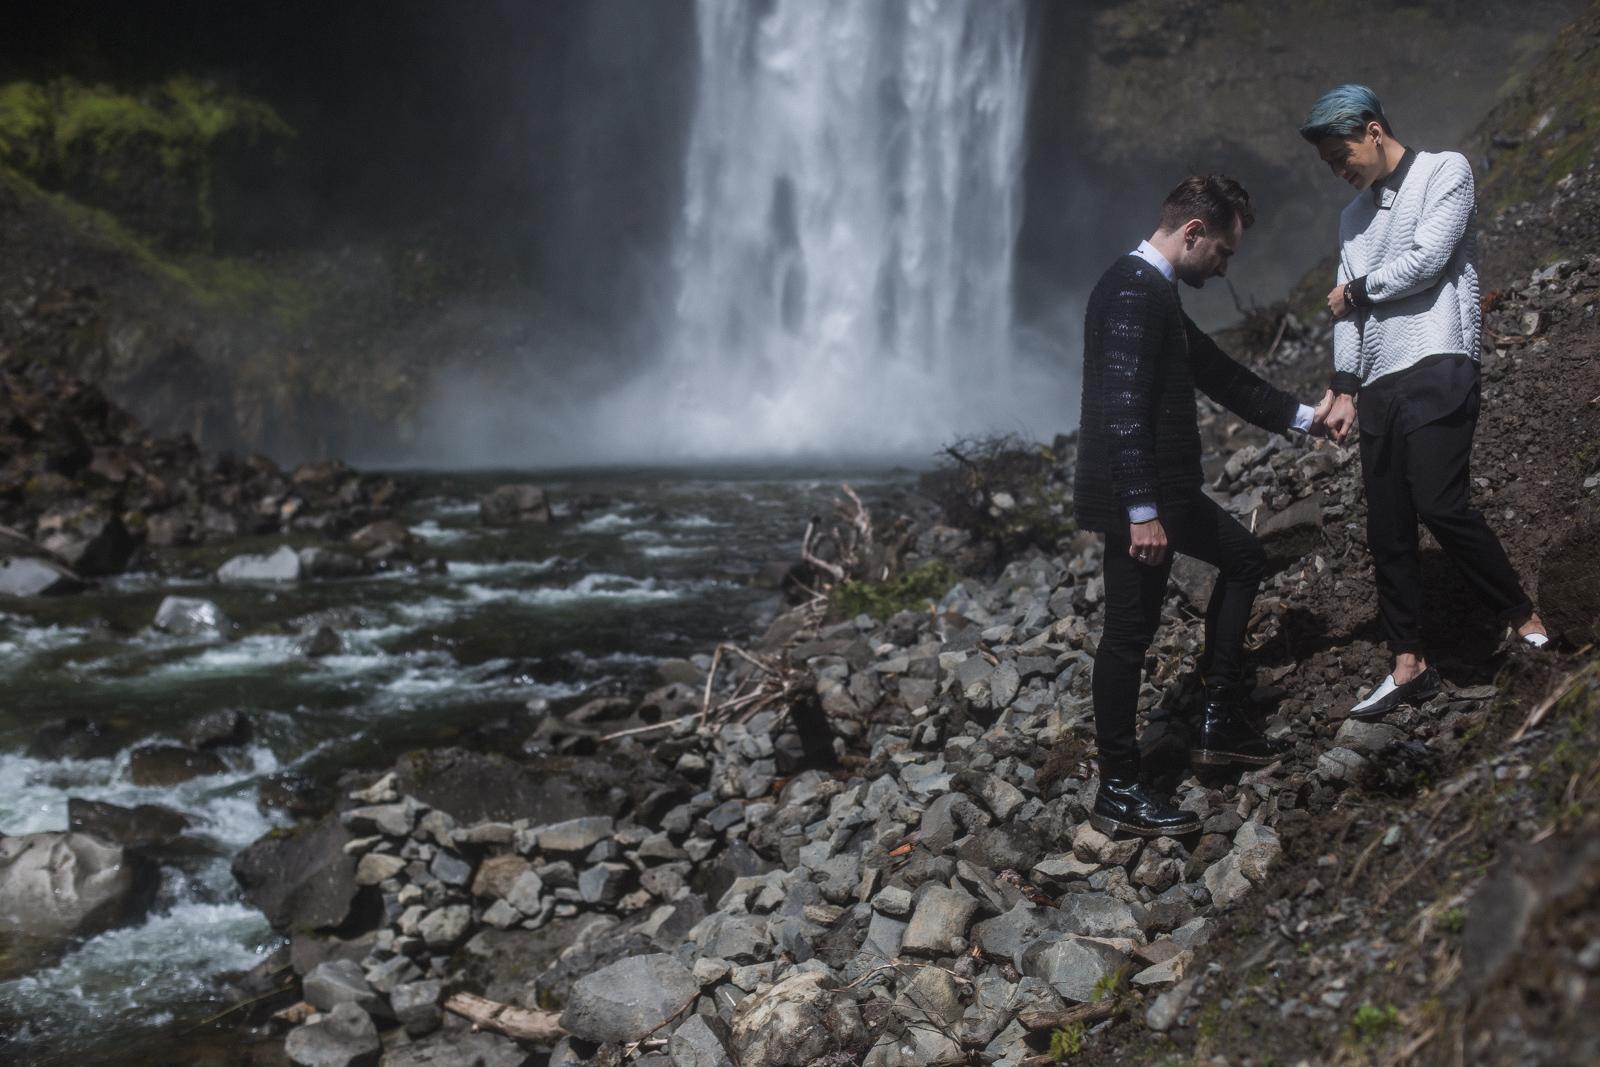 Brandywine-Falls-Engagement-Gay-wedding-01.jpg